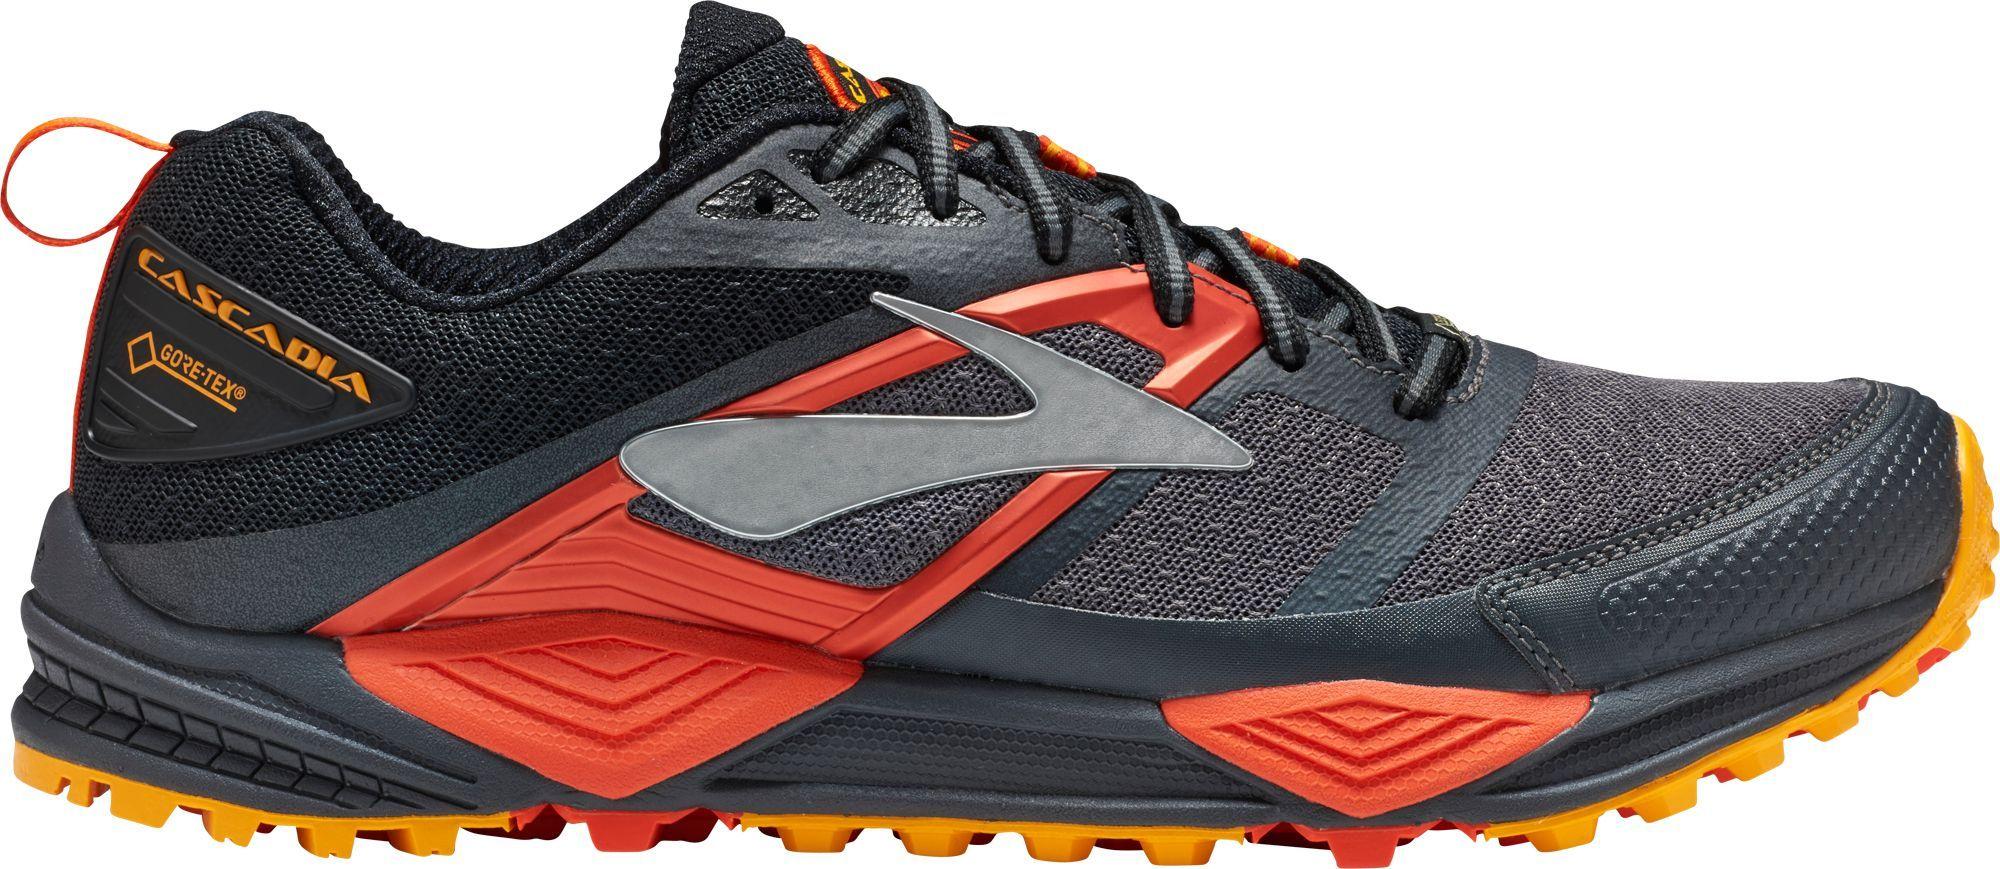 Brooks Men S Cascadia 12 Gtx Trail Running Shoes Mens Trail Running Shoes Trail Running Shoes Running Shoes For Men